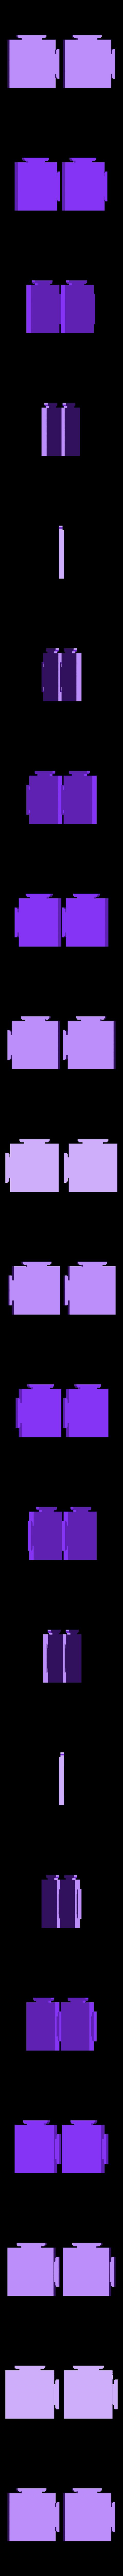 Tray_1_4.stl Download free STL file Chess set / Chess set • 3D printable model, OC3D